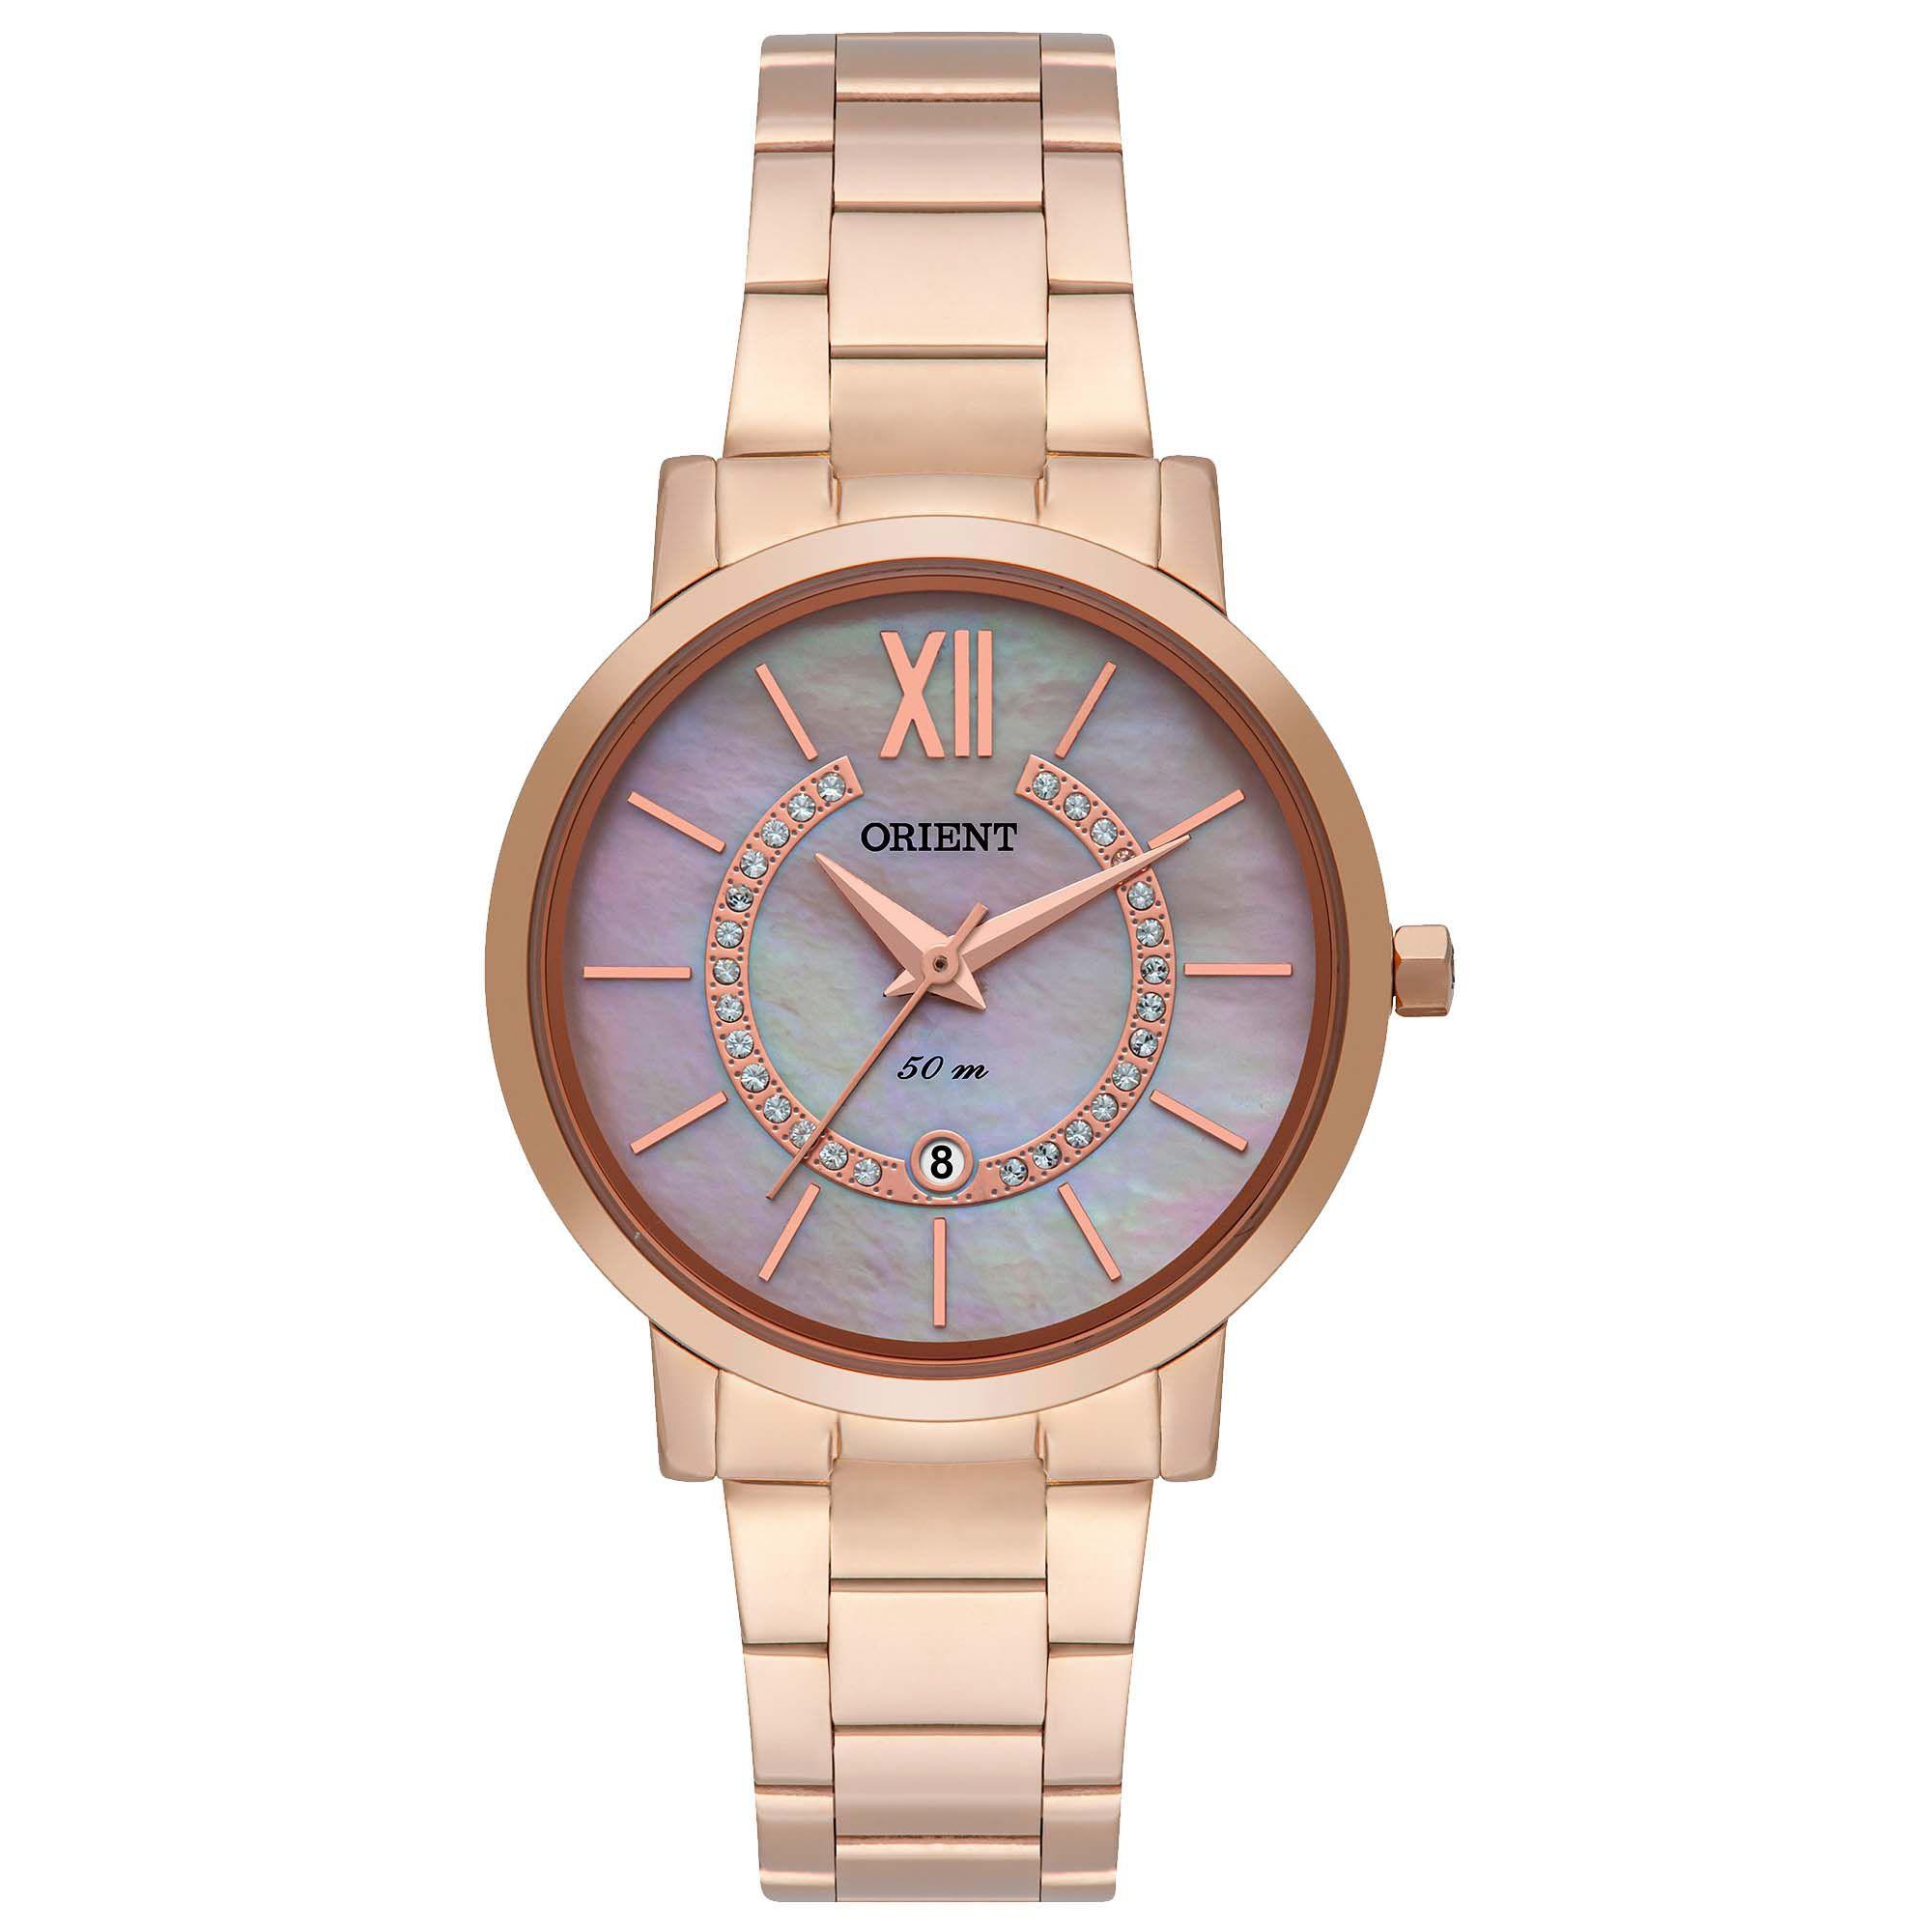 Relógio Feminino Orient FRSS1057 R3RX